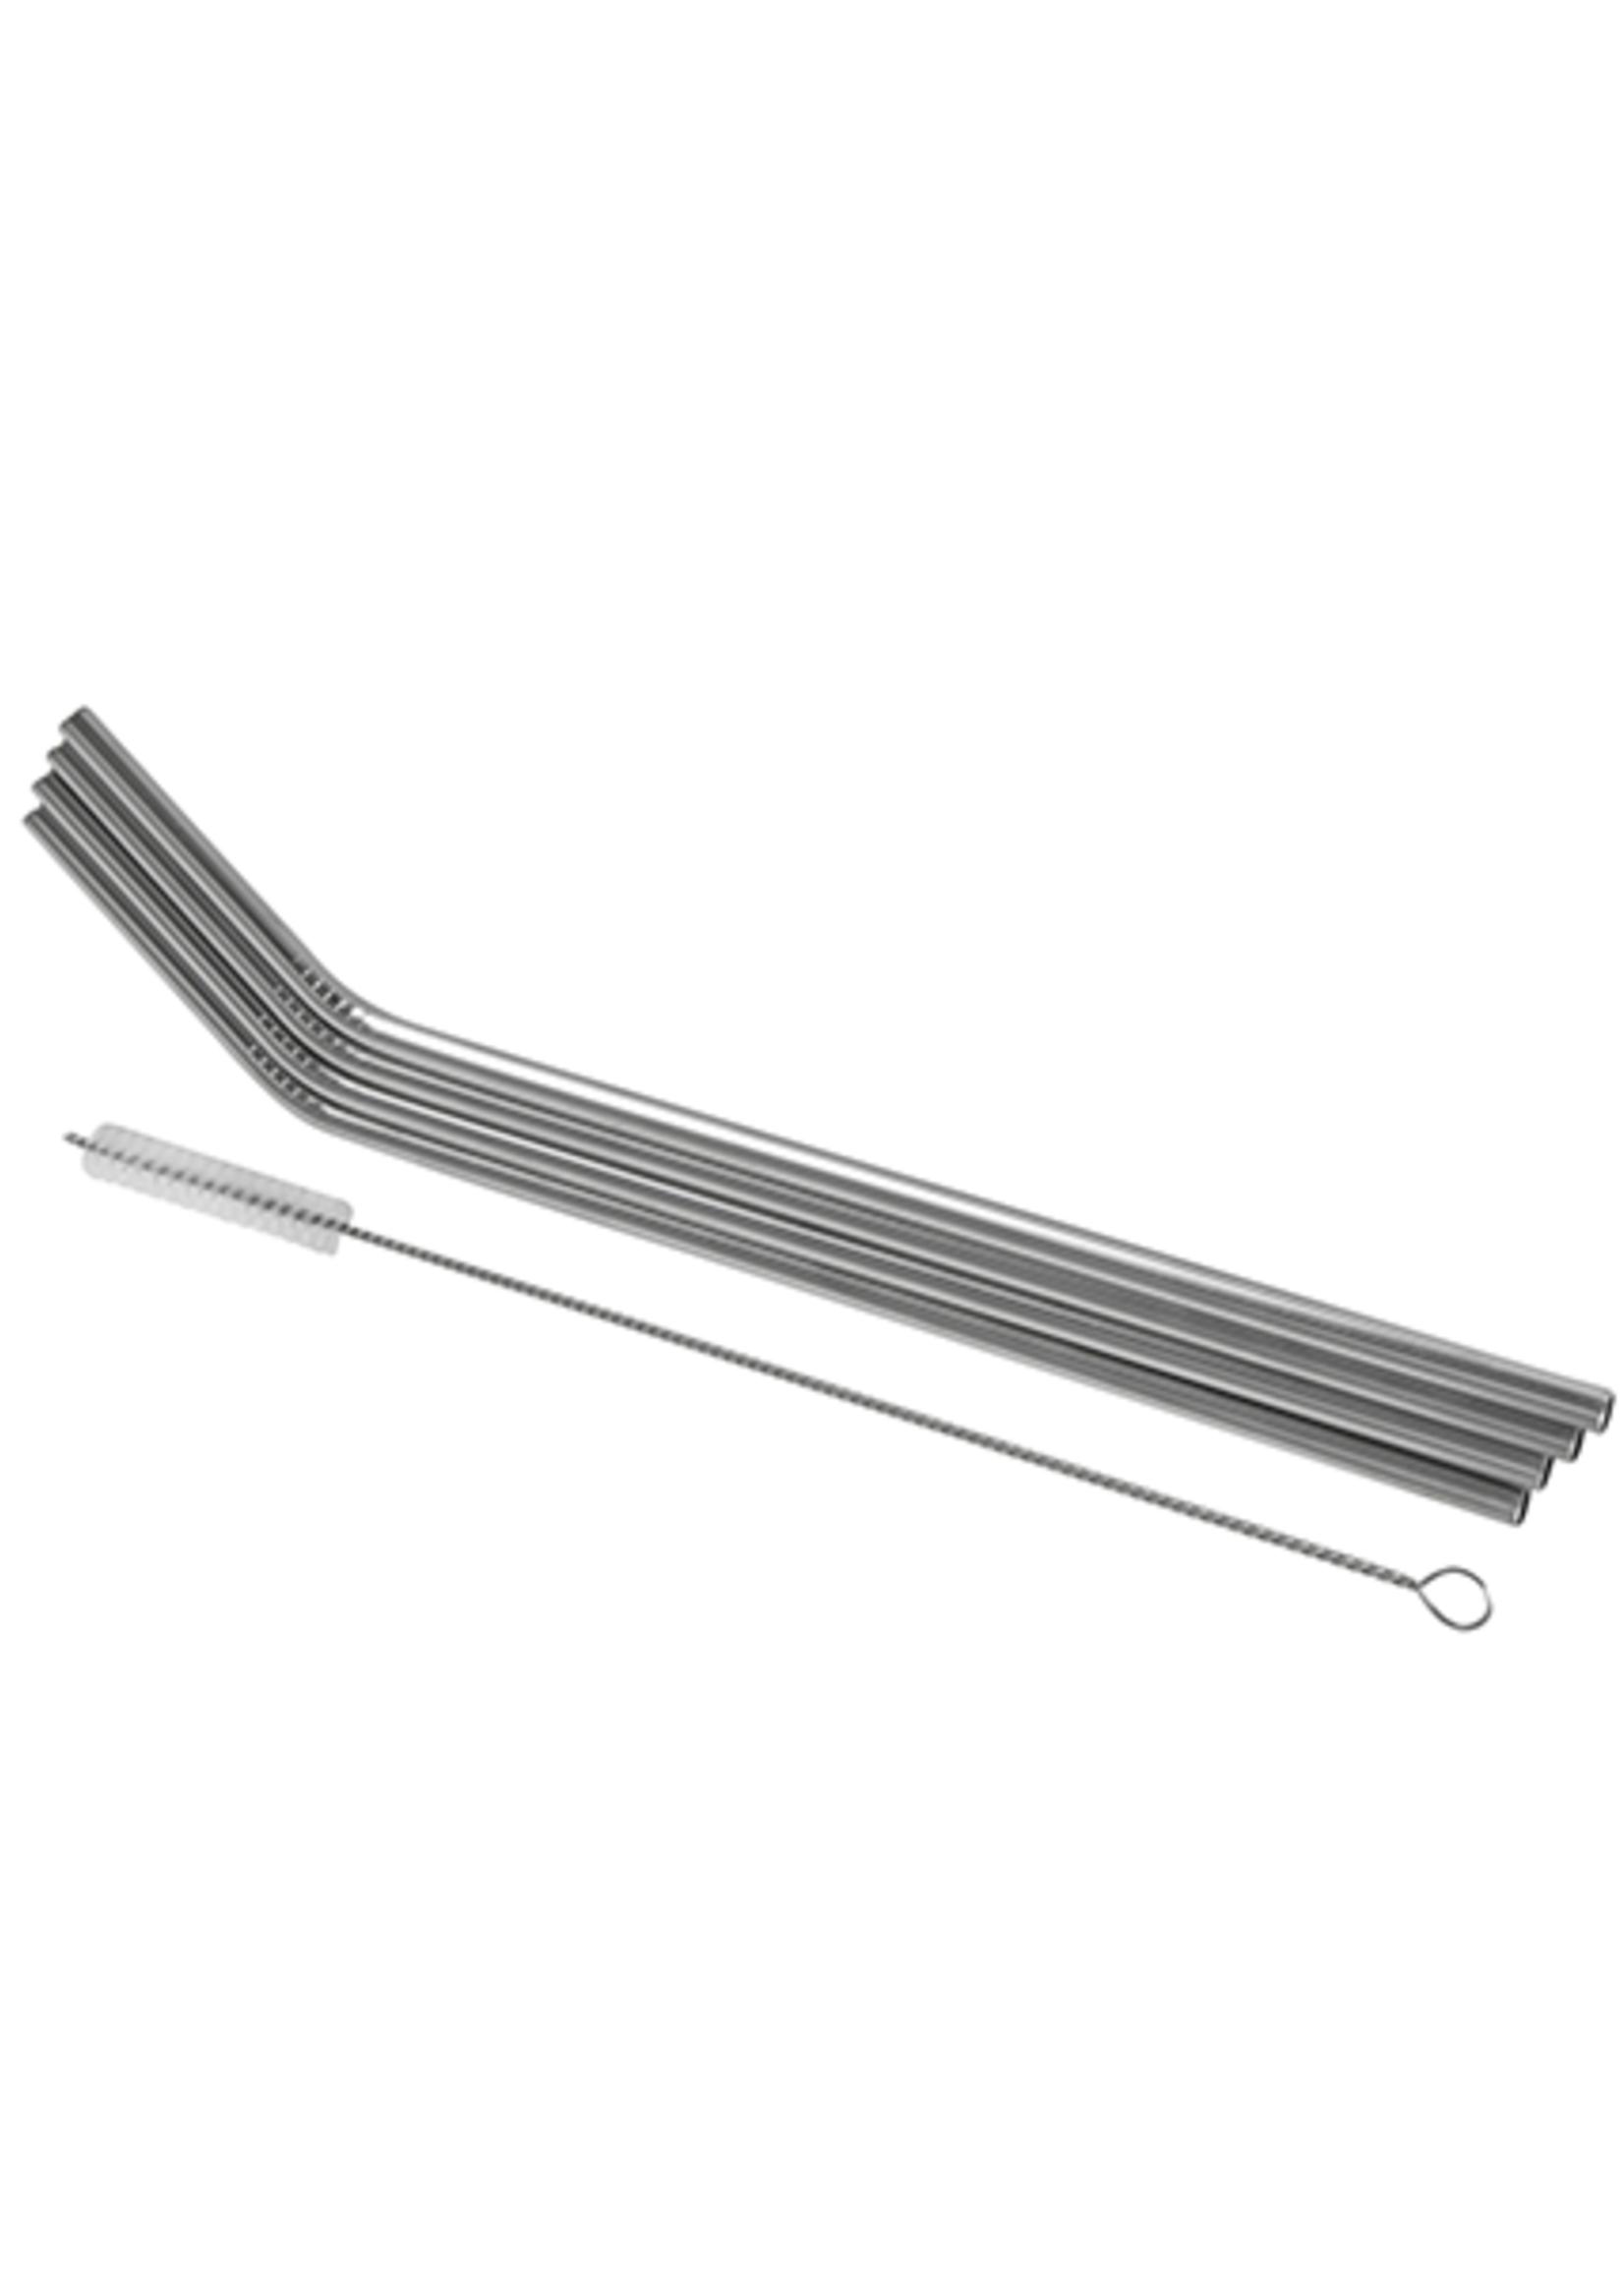 Avanti Homewares Stainless Steel Reusable Straws Set